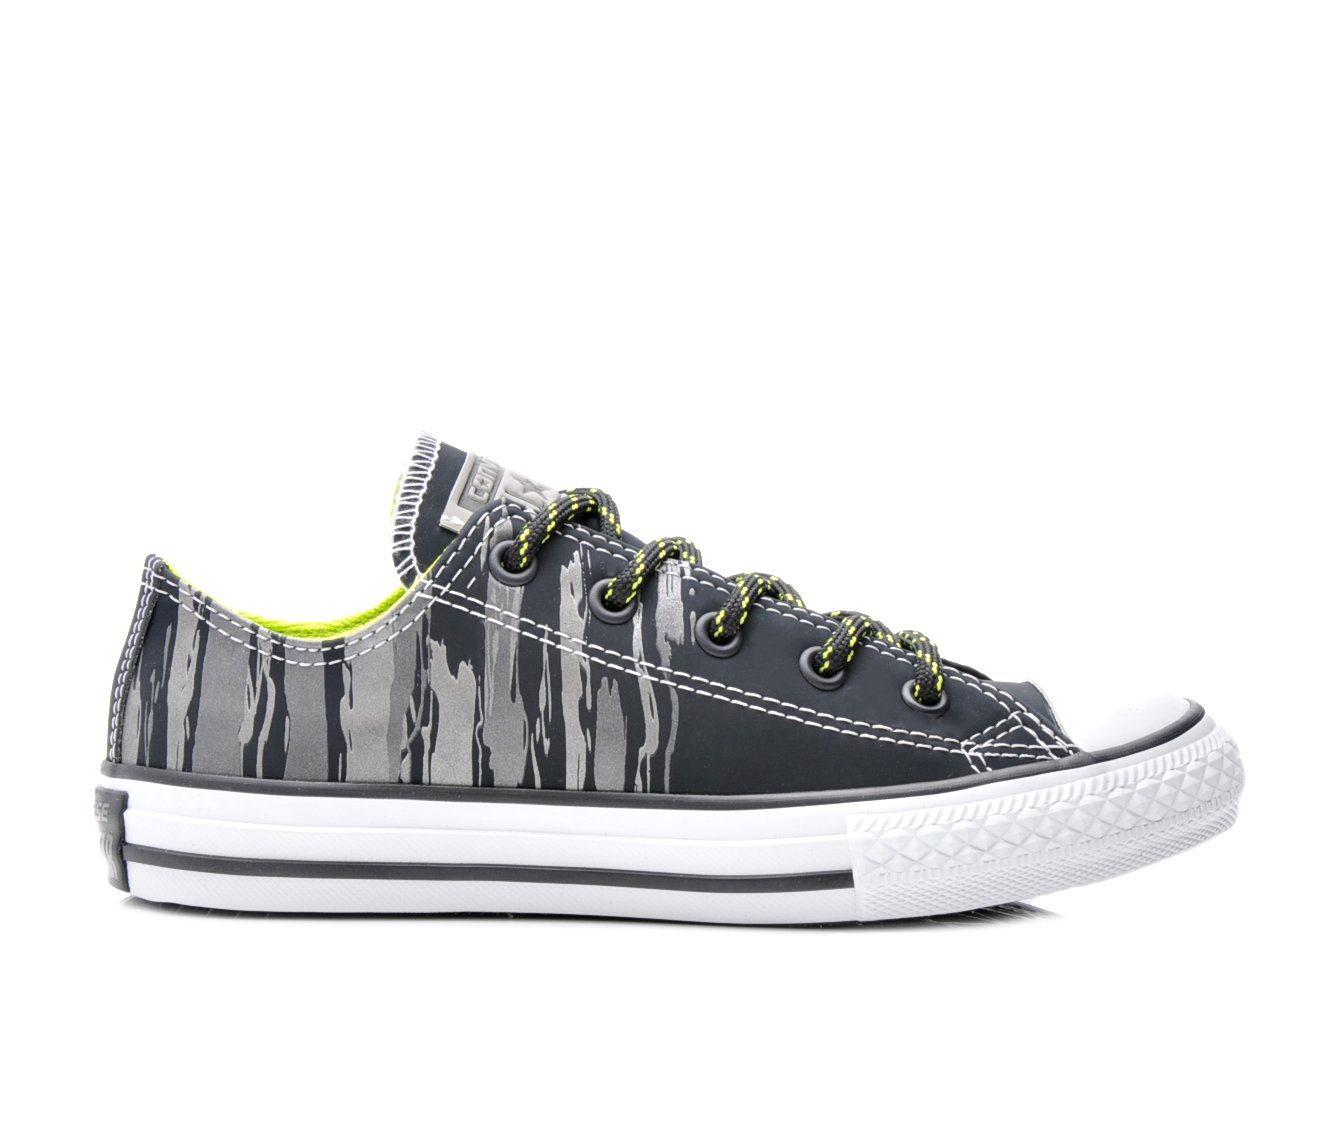 Boys' Converse Chuck Taylor Ox Flash Flood Sneakers (Black)